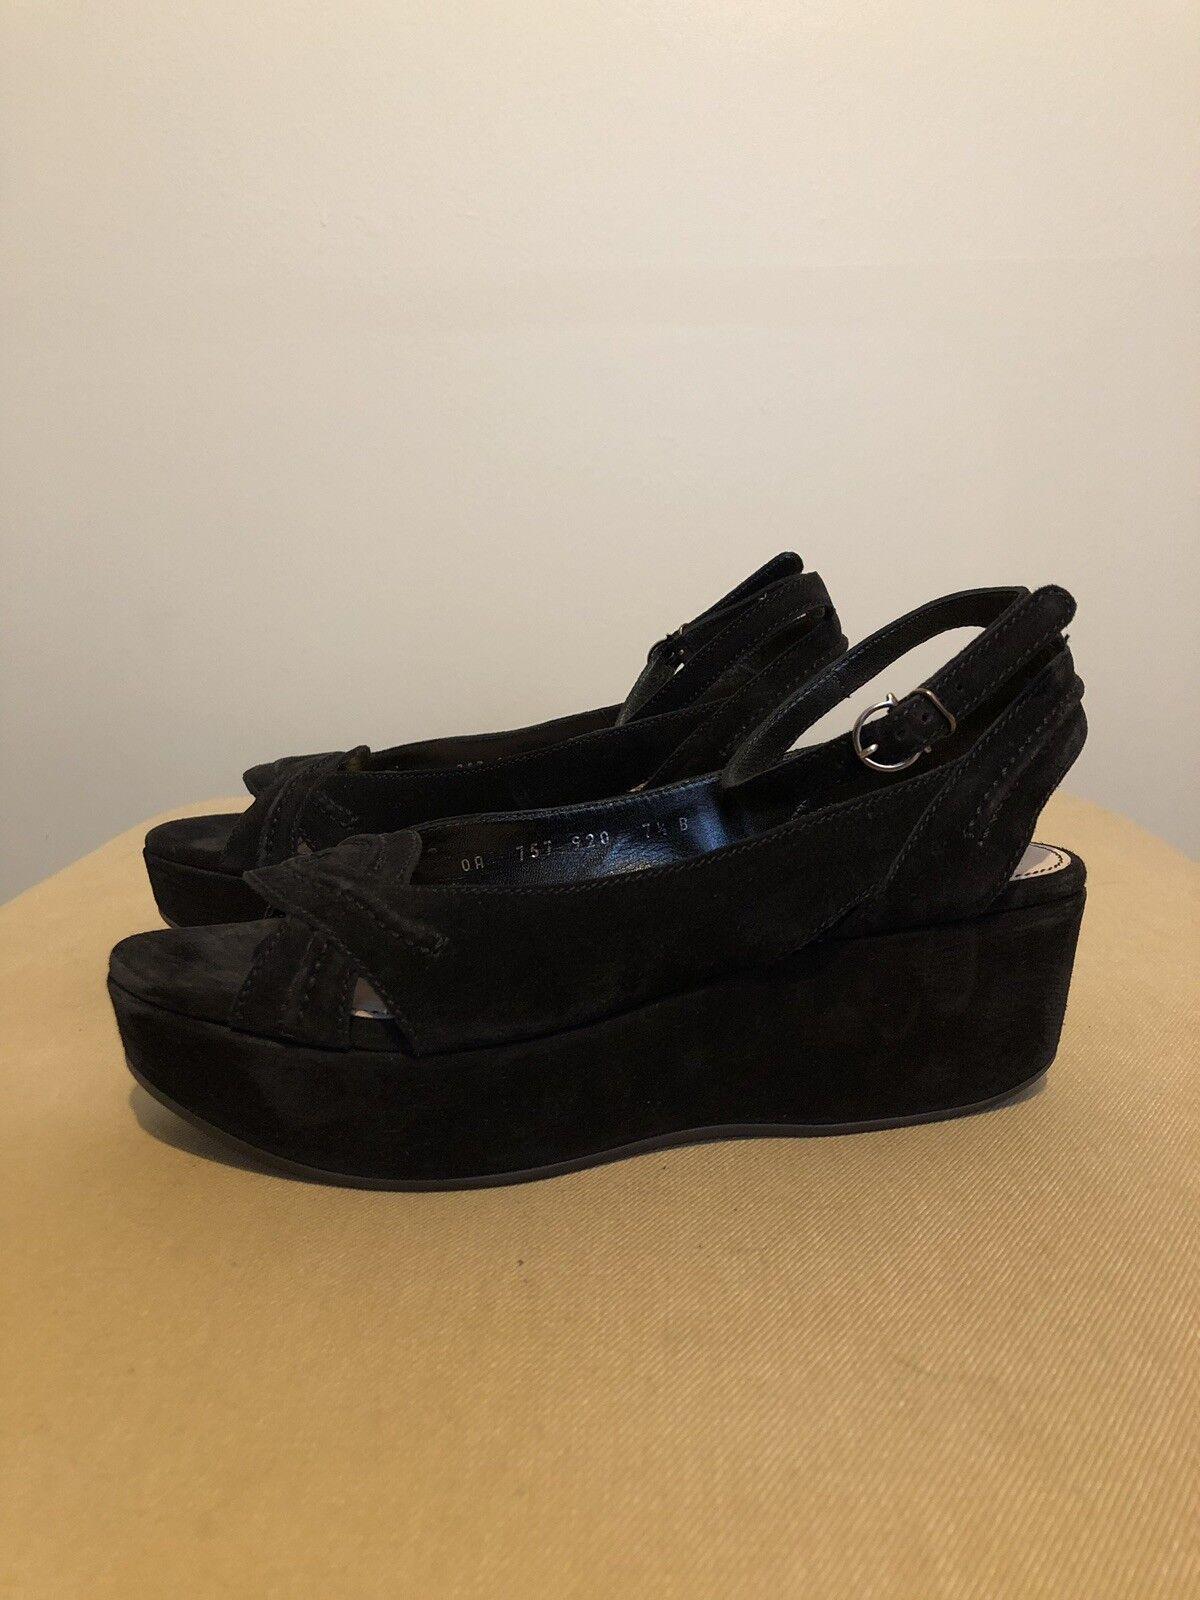 Salvatore  Ferragamo Suede Sandals.Dimensione 7.5B.  outlet